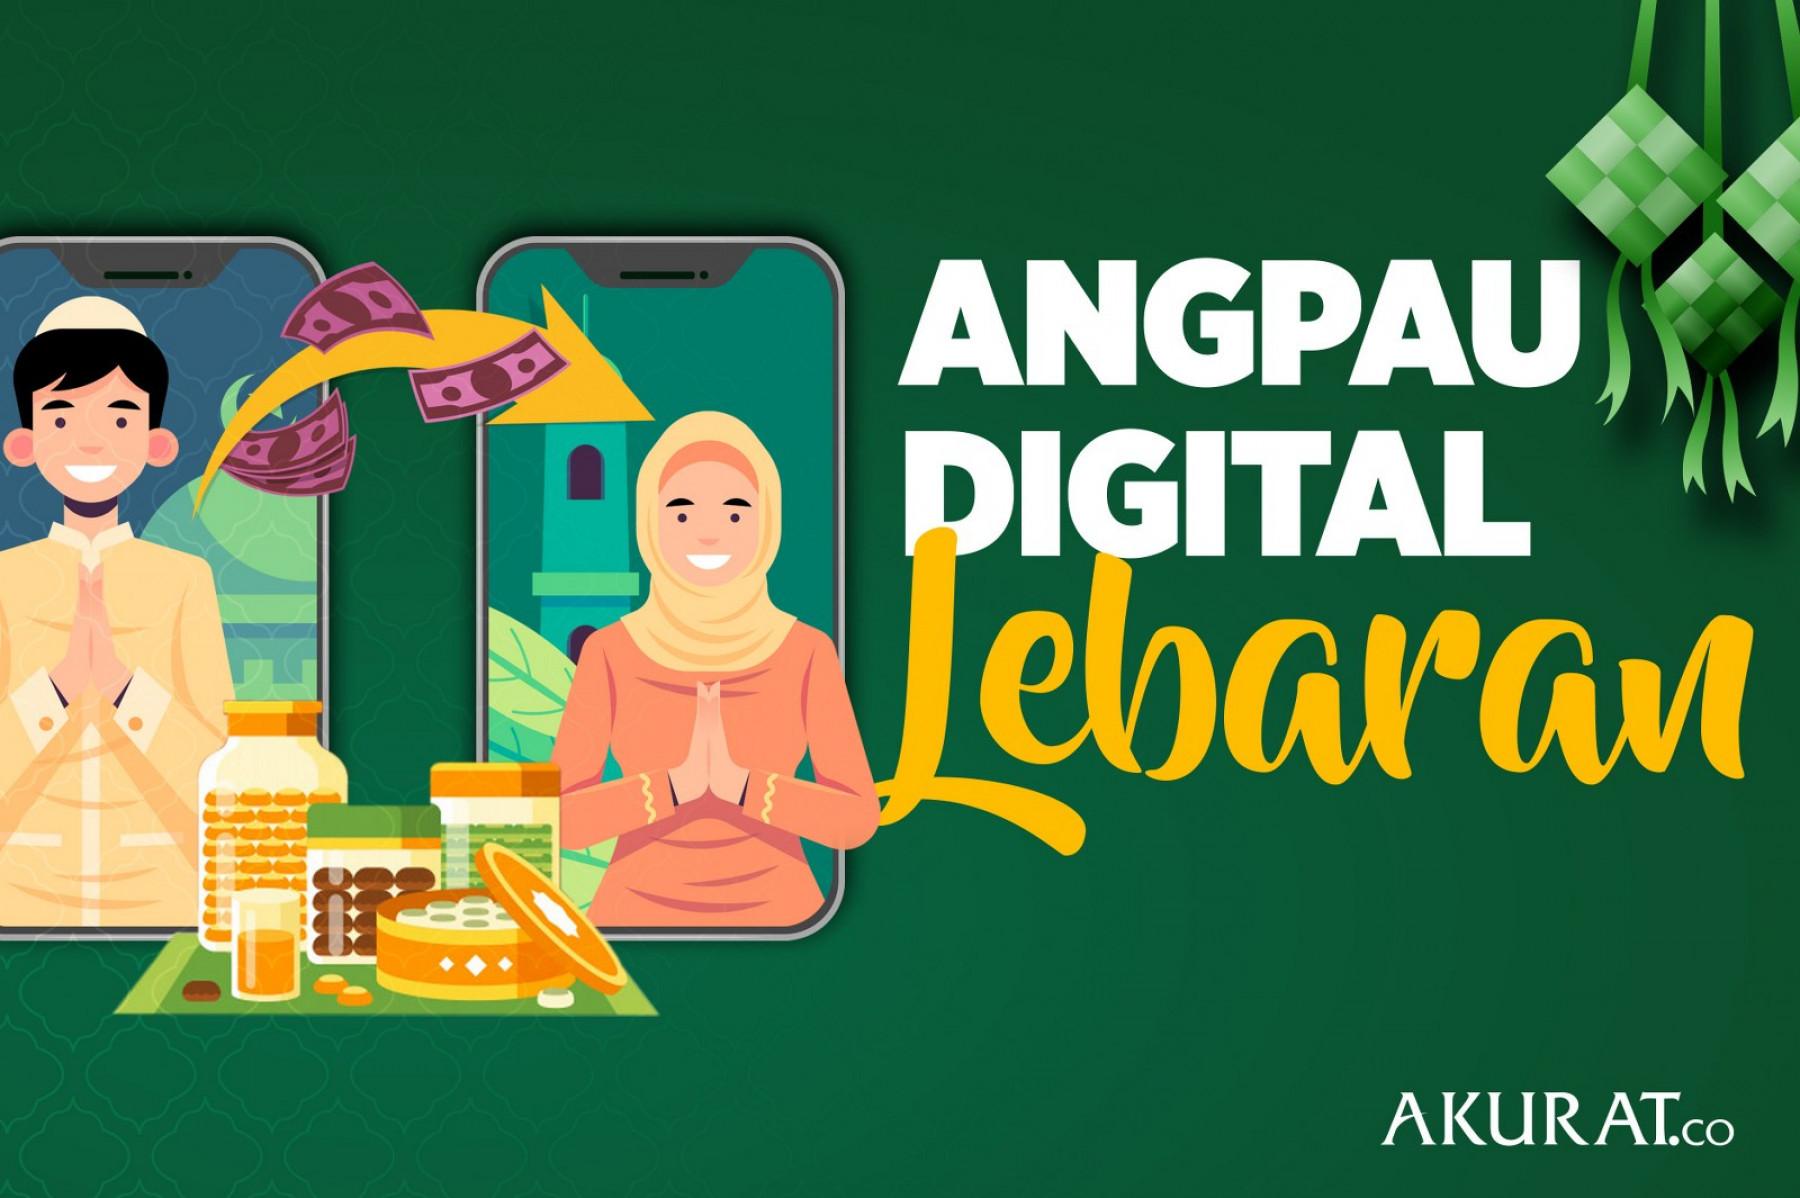 Angpau Digital Lebaran